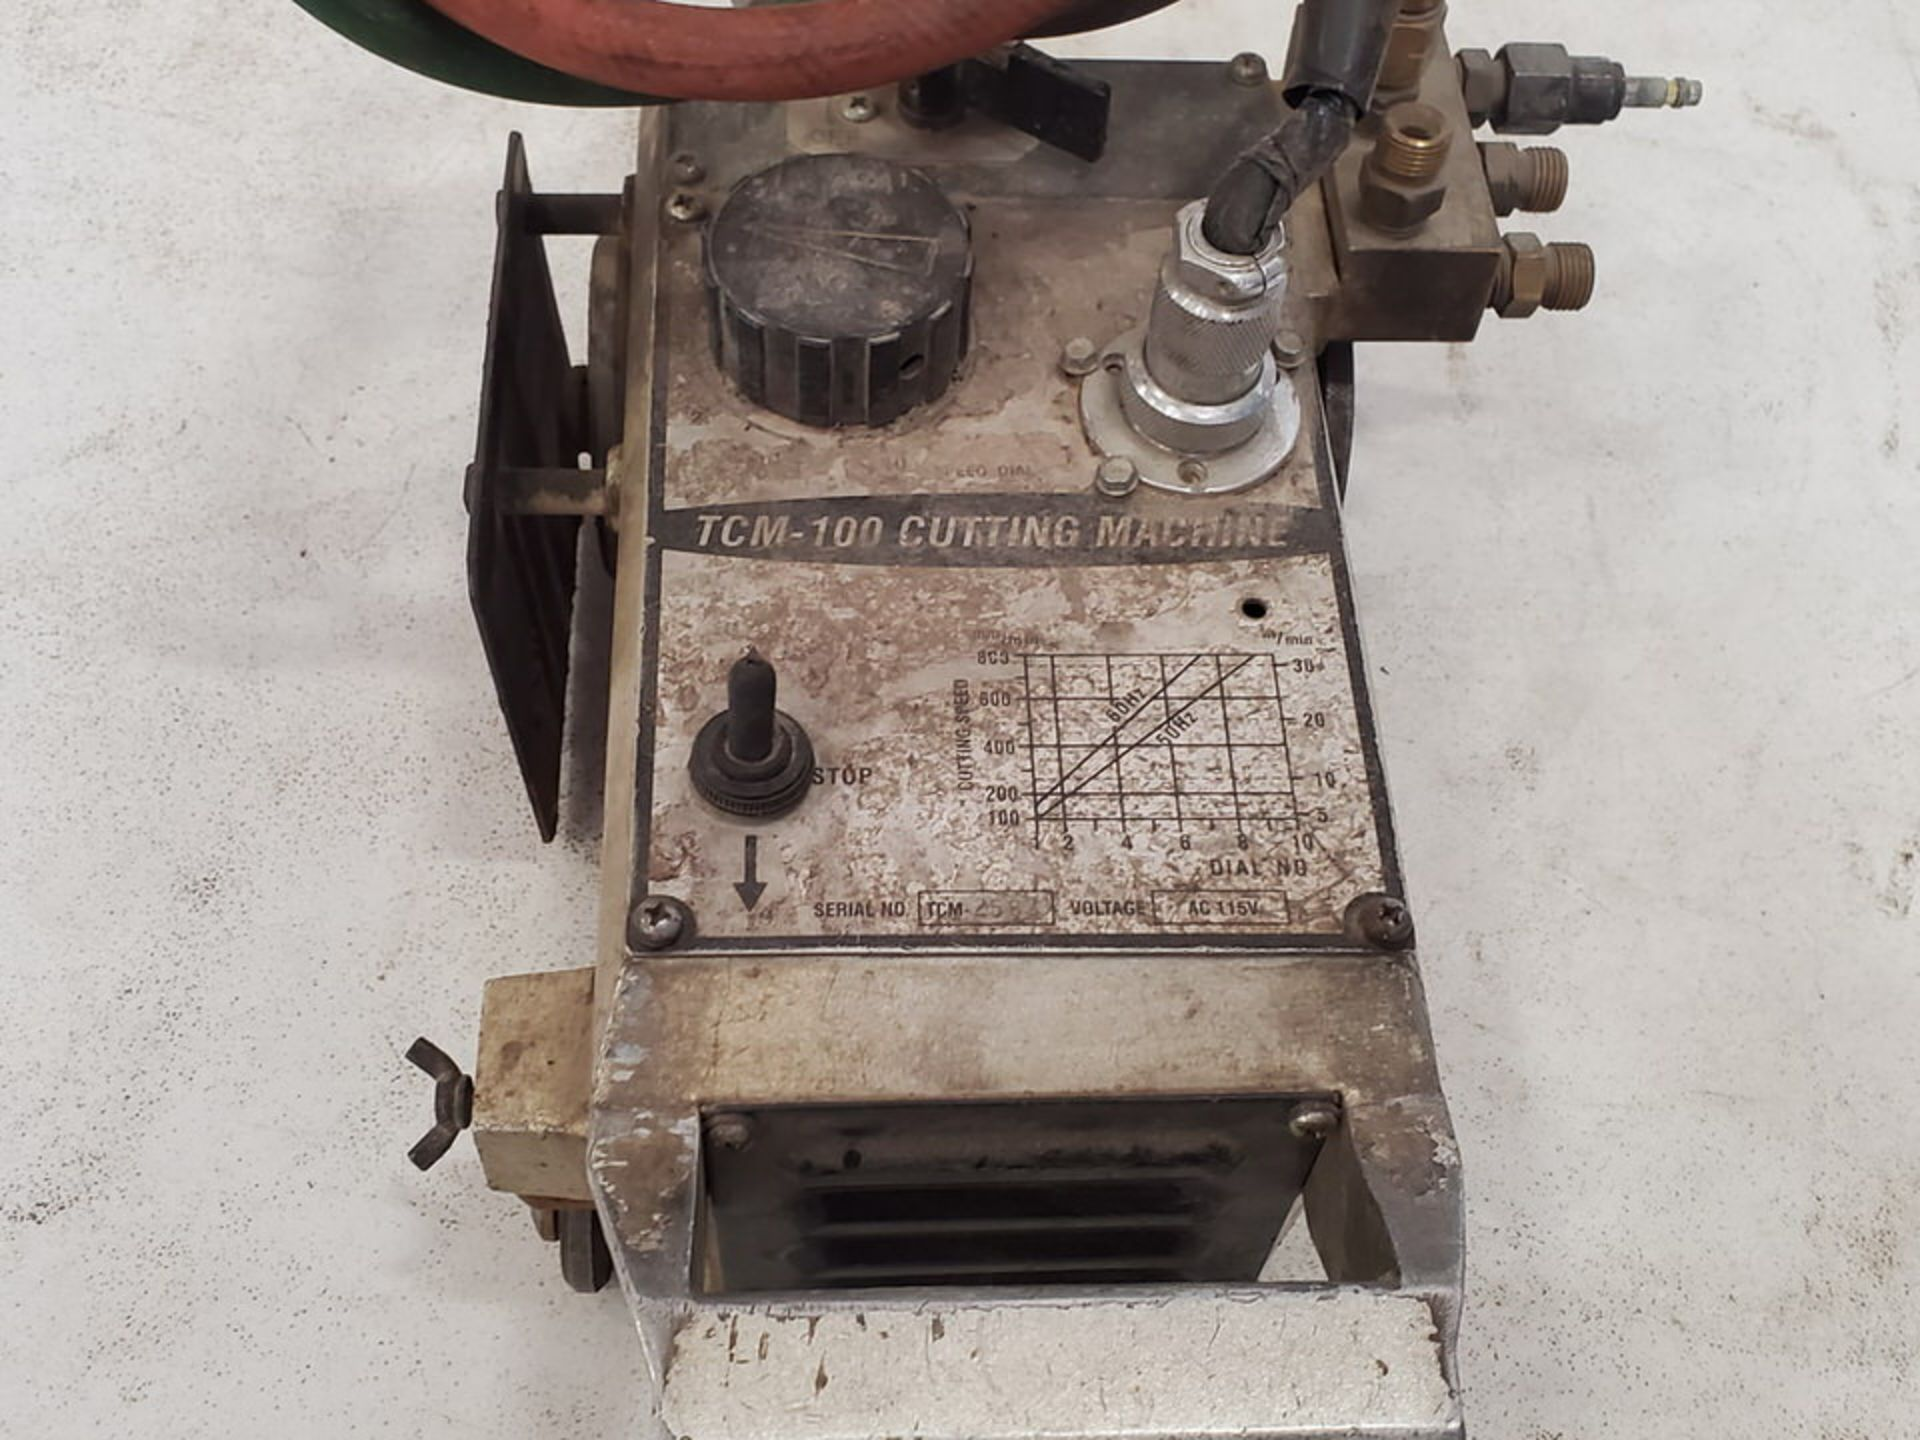 Profax Portable Track Cutting Machine 115V - Image 4 of 5